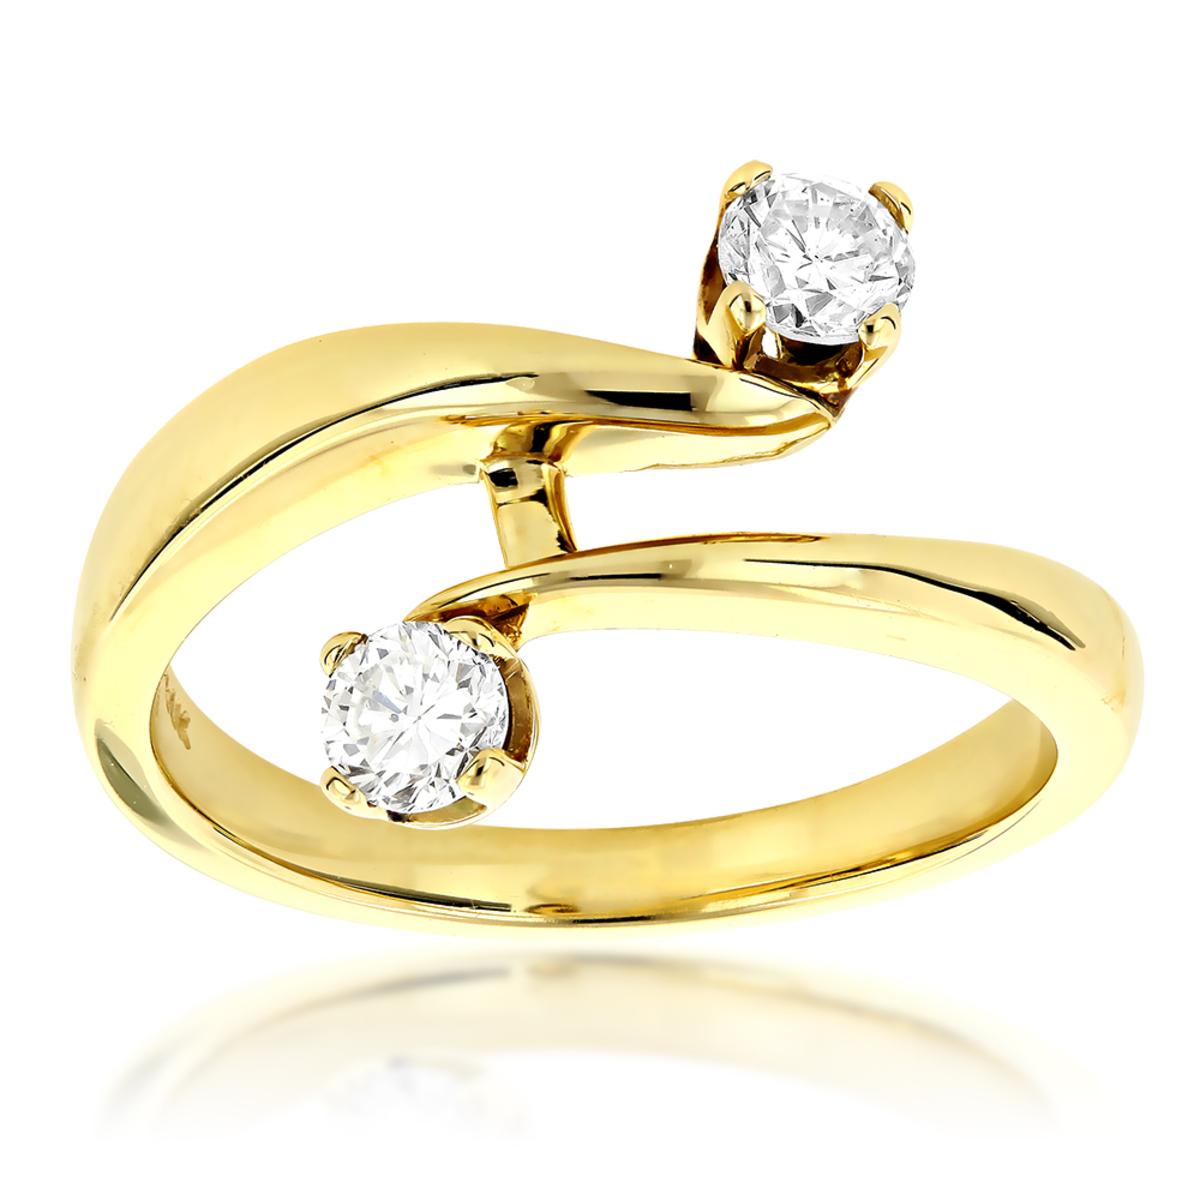 14K Gold Right Hand Ladies Diamond Ring 0.50ct